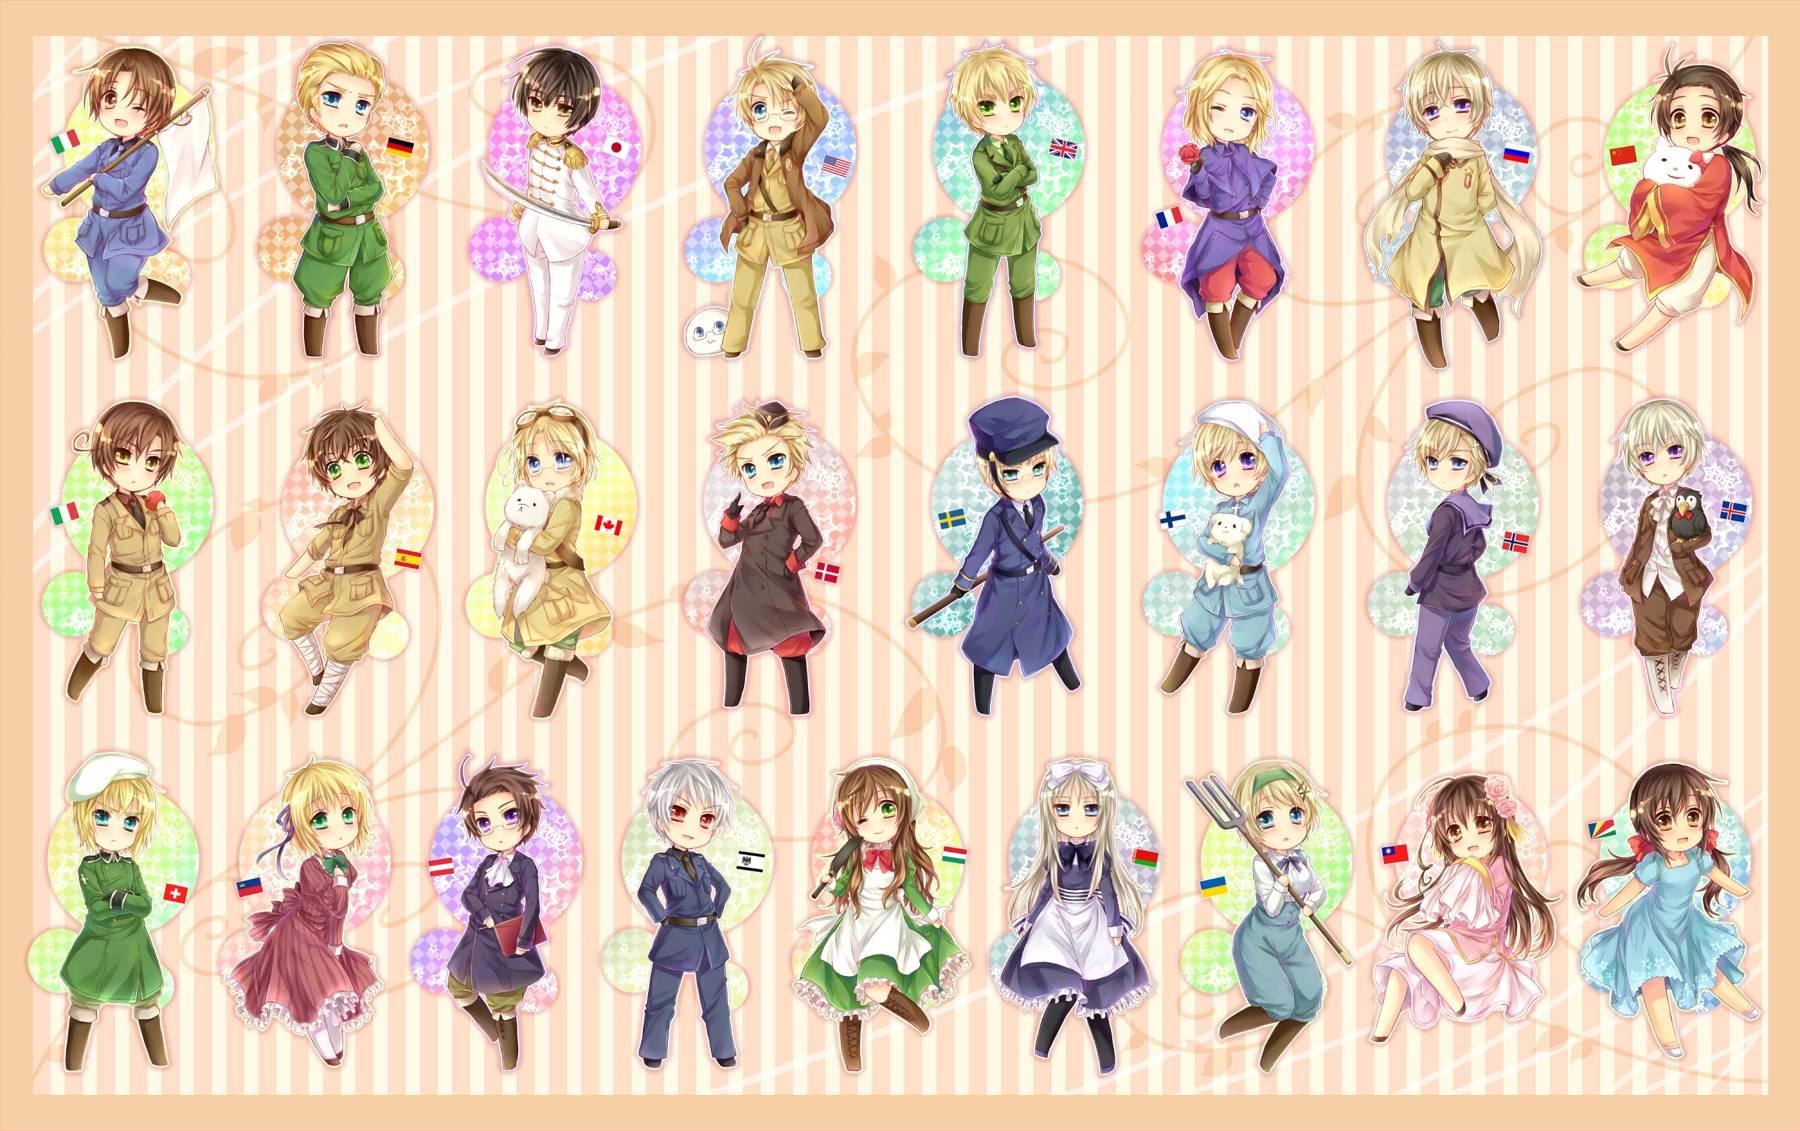 Image Result For Anime Chibi Wallpaper For Laptop